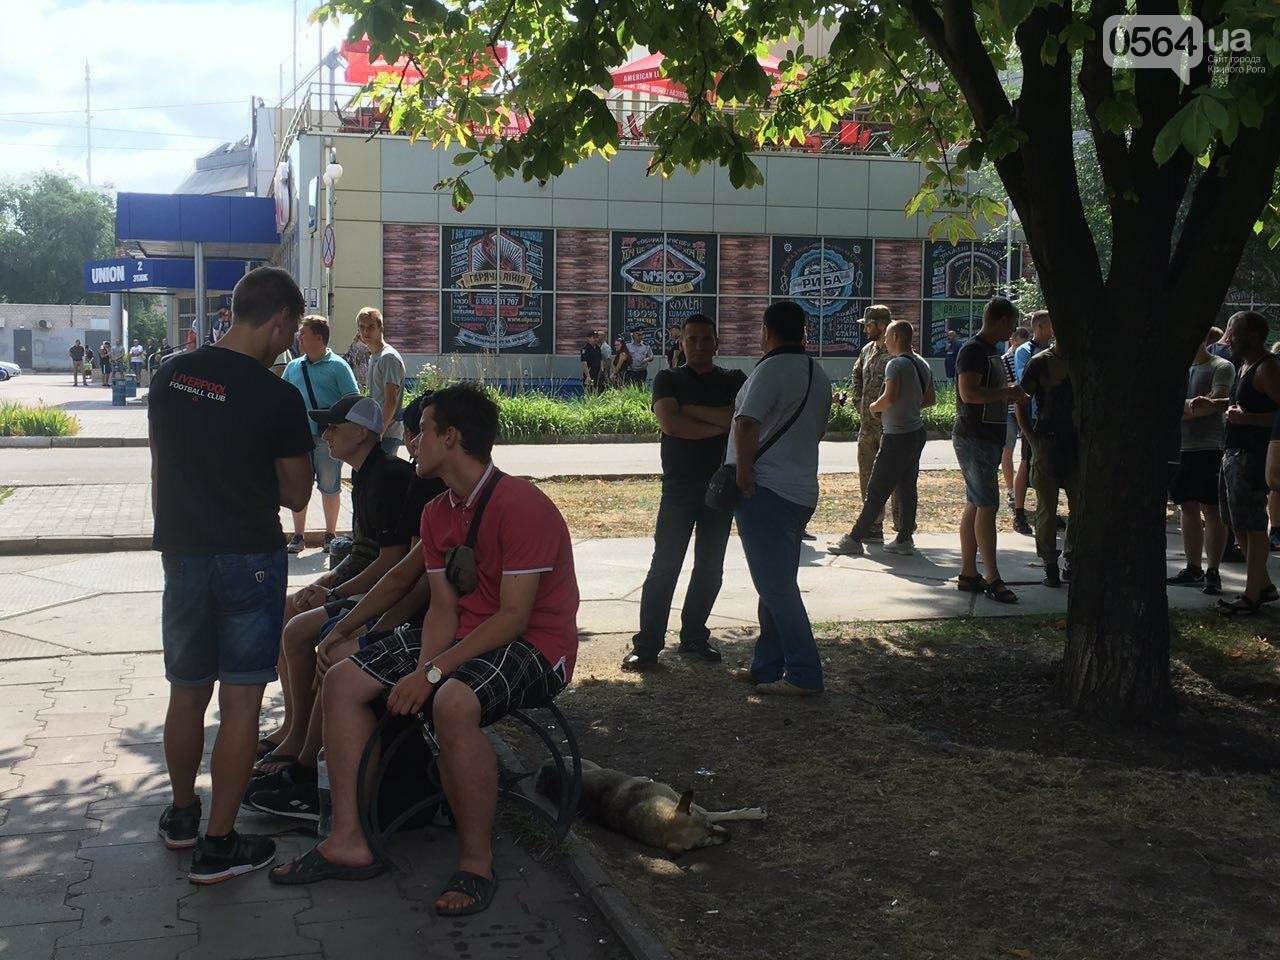 Трубят рога: В Кривом Роге собрались противники ЛГБТ-движения, - ФОТО, ВИДЕО, фото-9